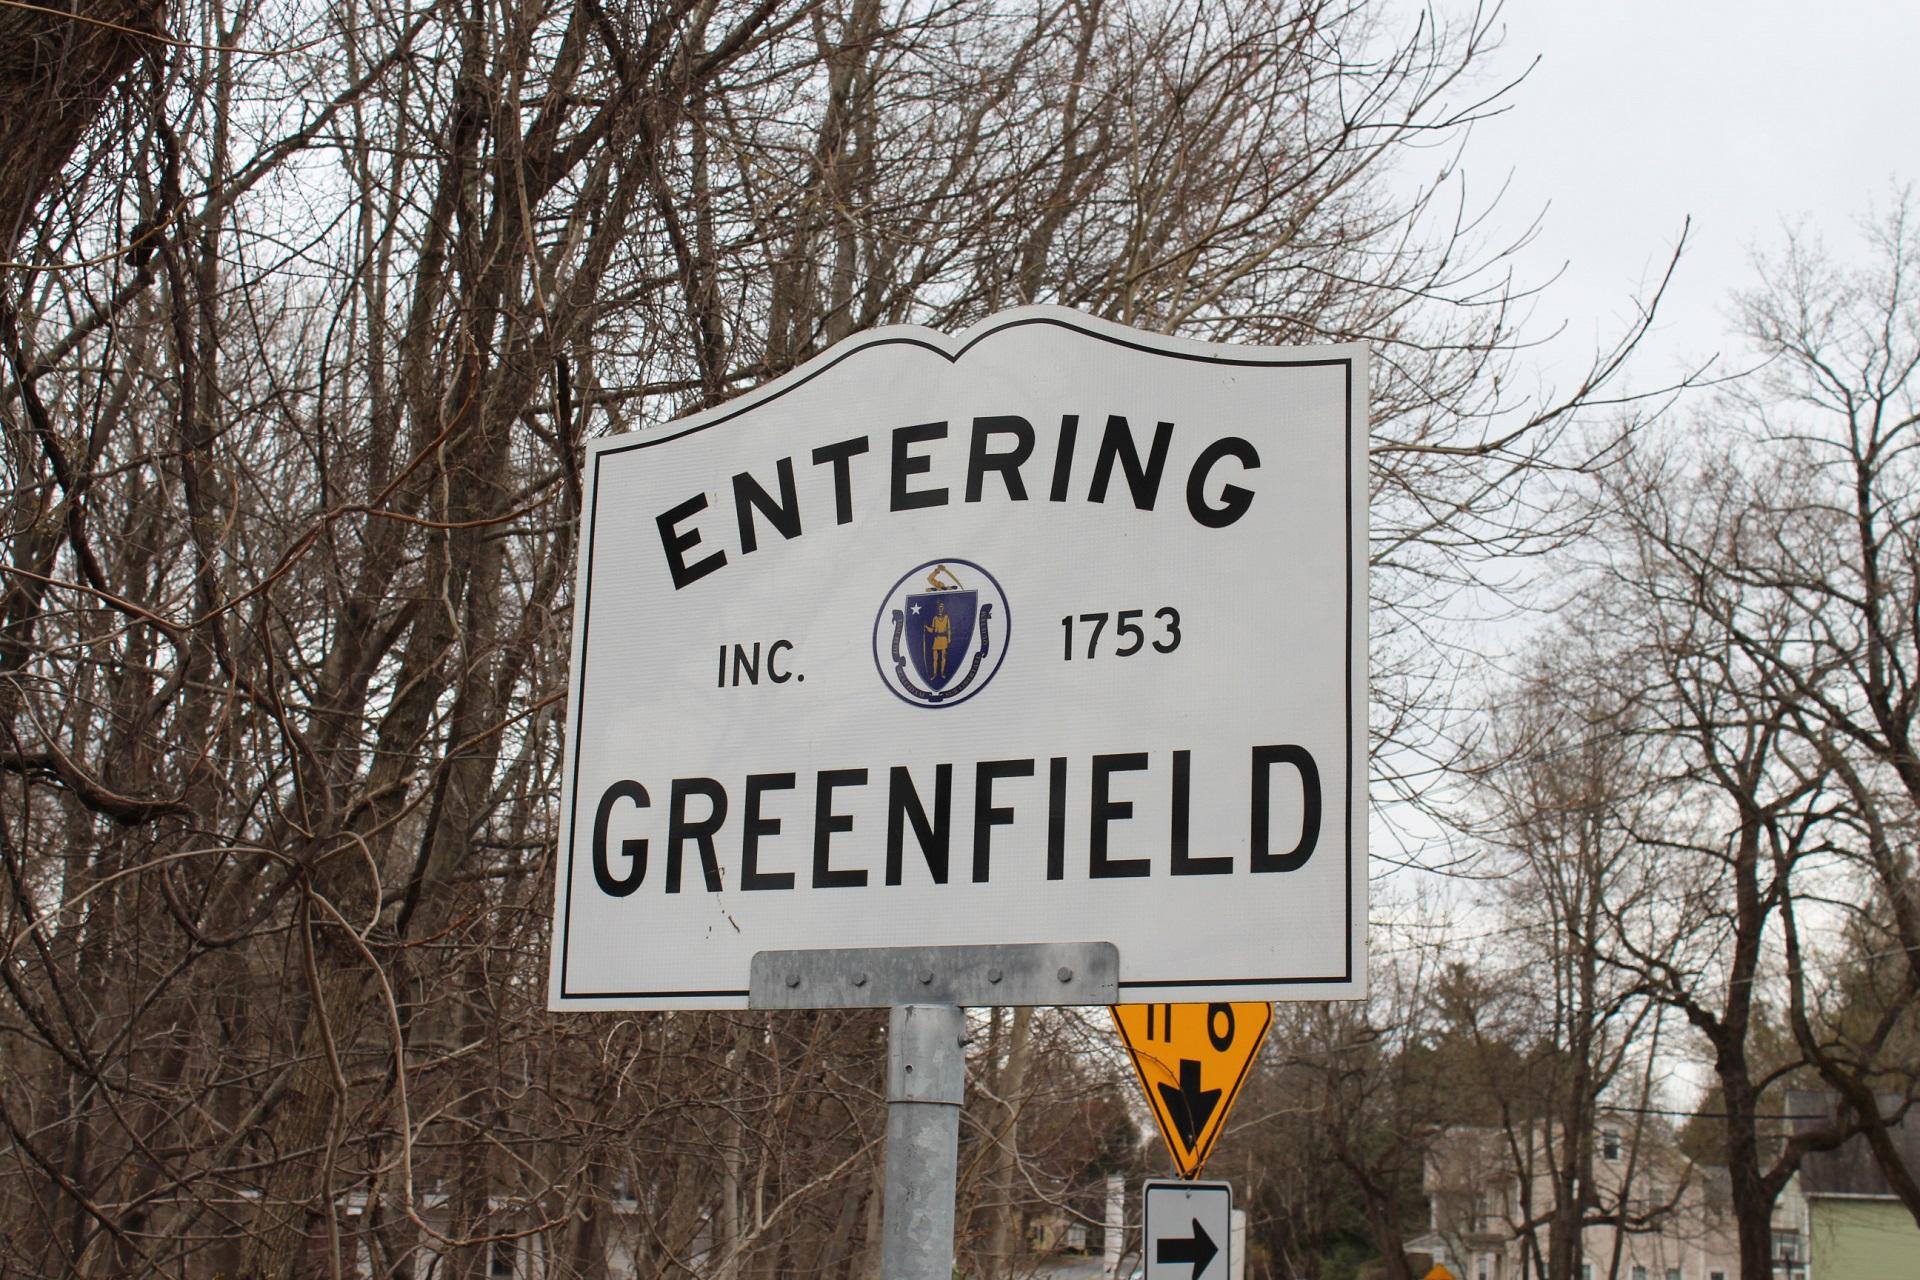 TownSigns_Greenfield_1537717389827.jpg